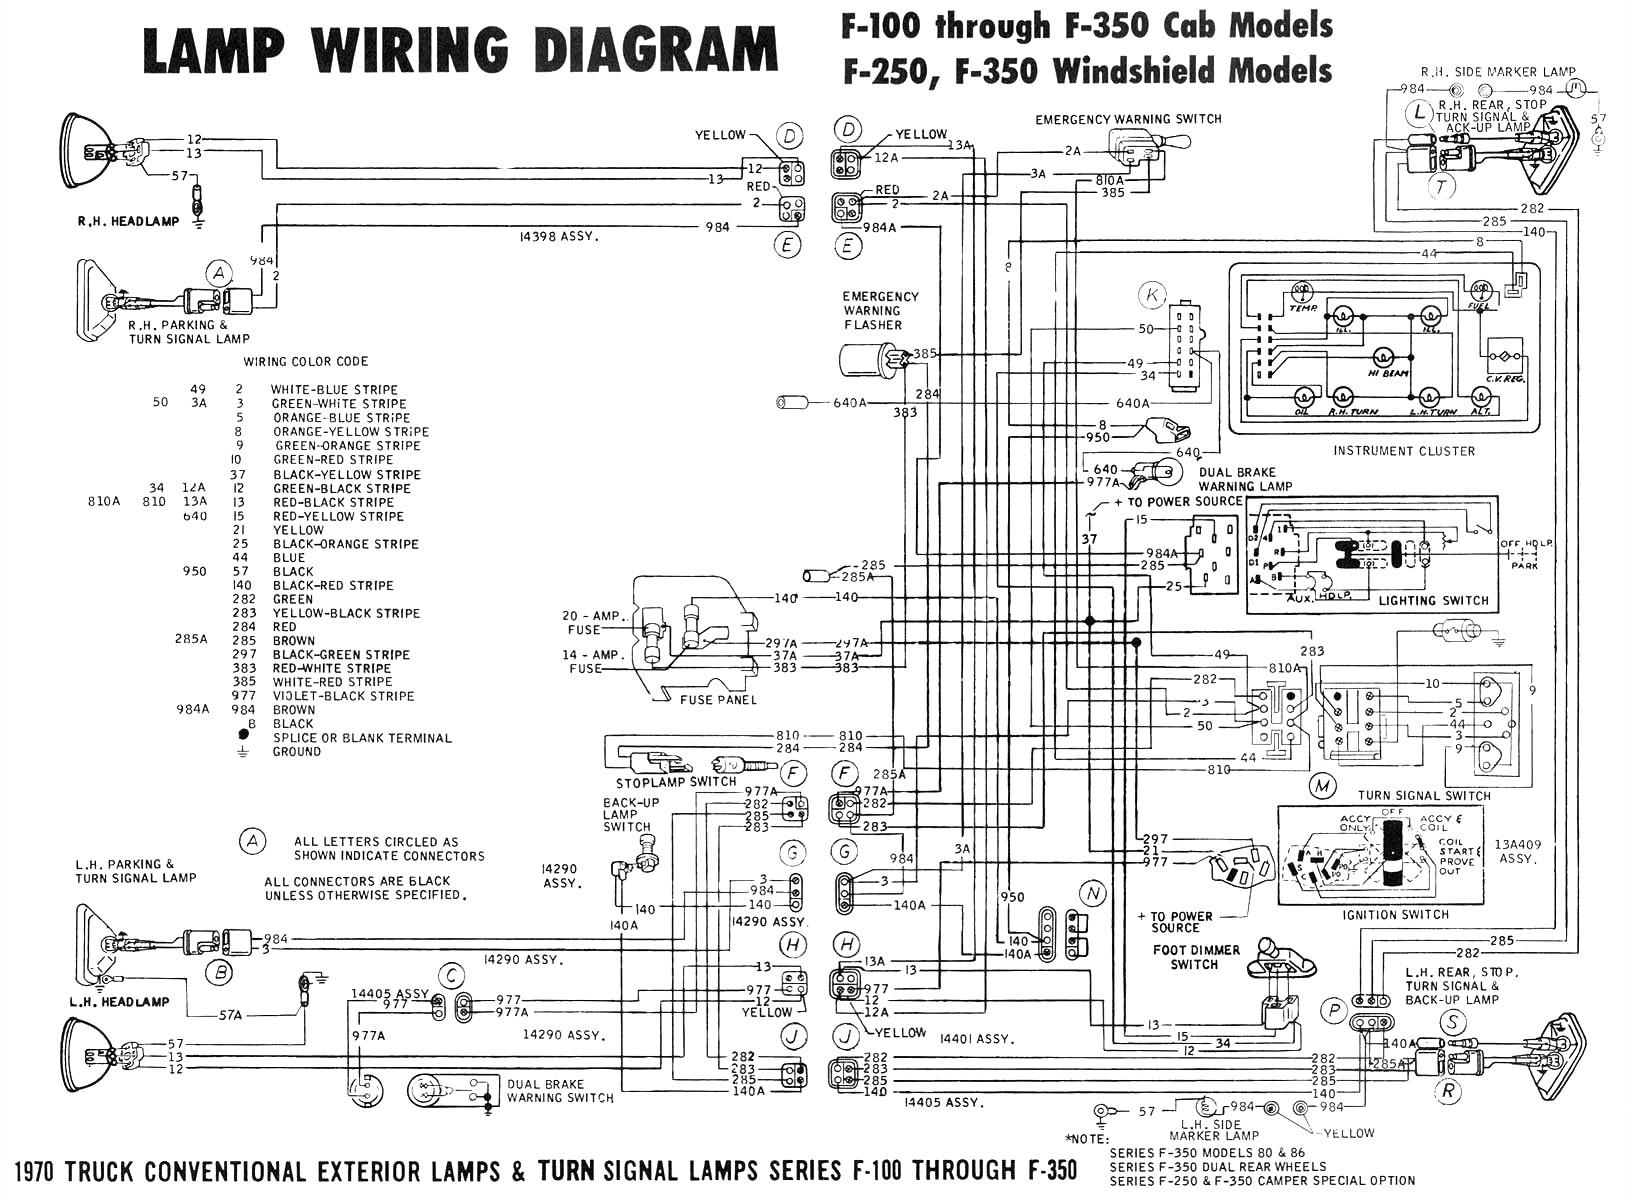 2005 ford e450 wiring diagram wiring diagram blog450 ford electrical wiring 2005 wiring diagram sheet 2005